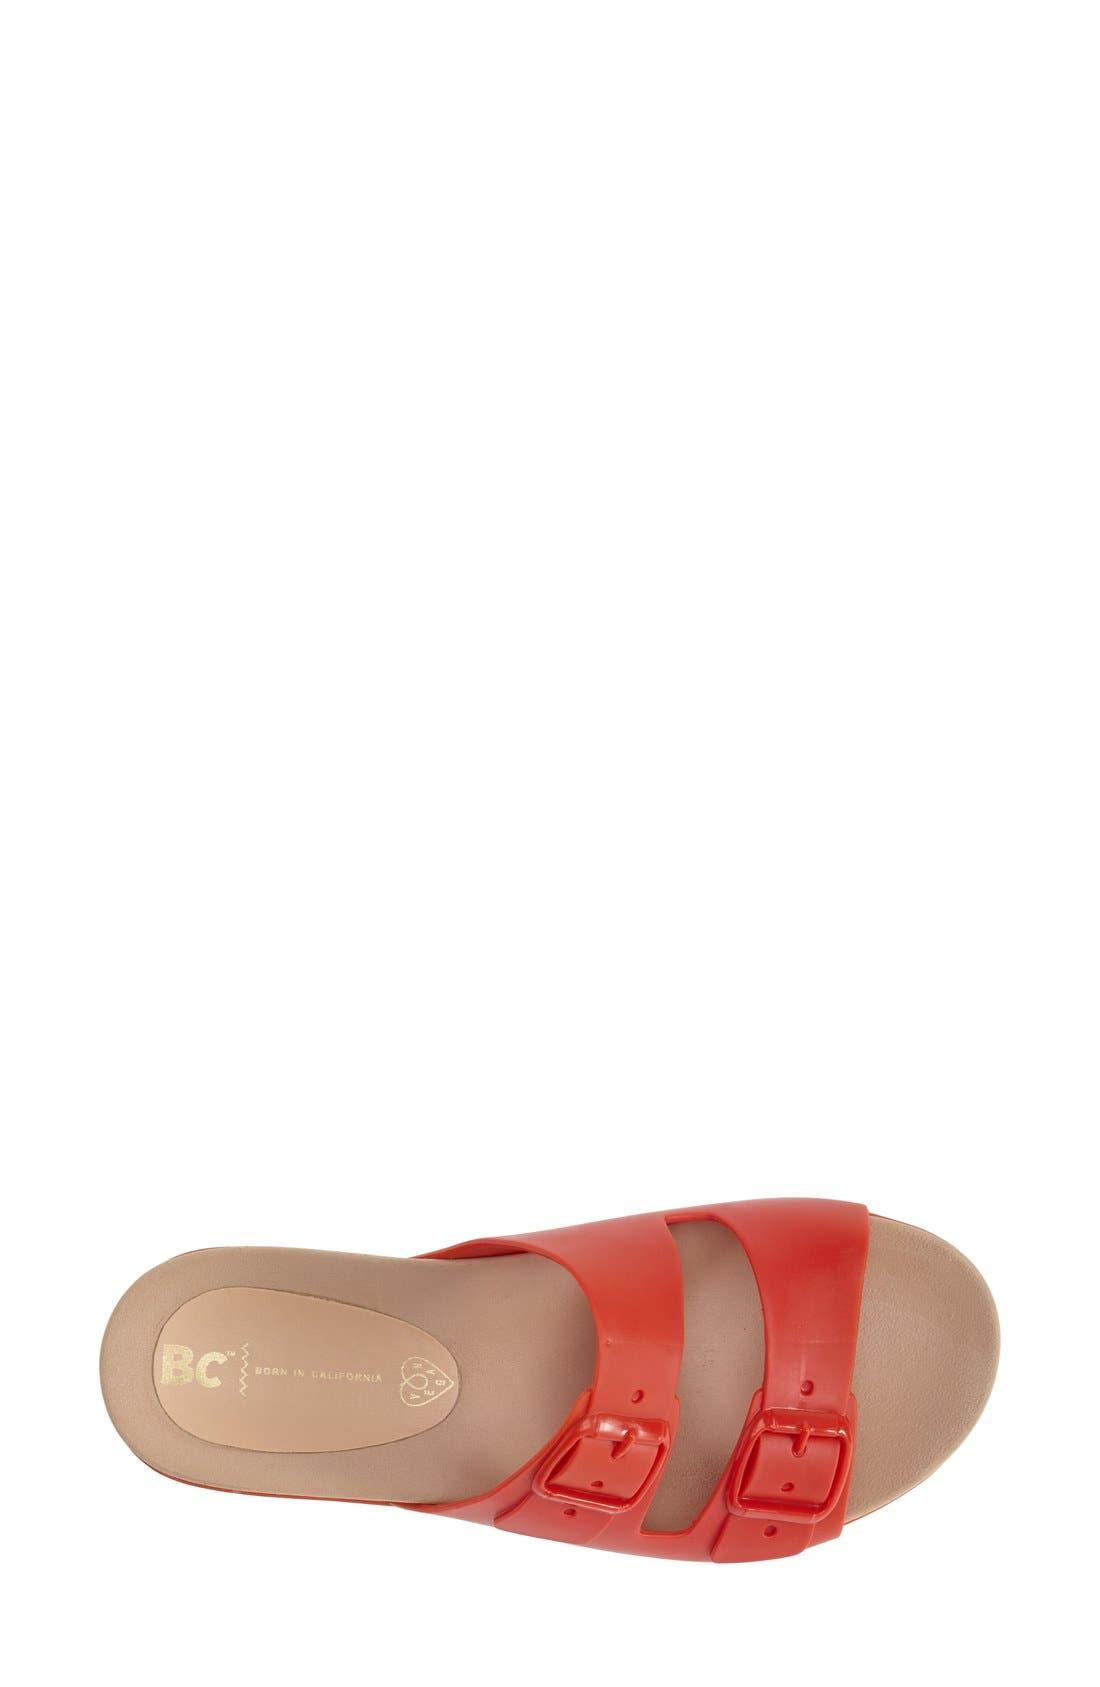 Alternate Image 3  - BC Footwear 'Dim The Lights' Slide Sandal (Women)